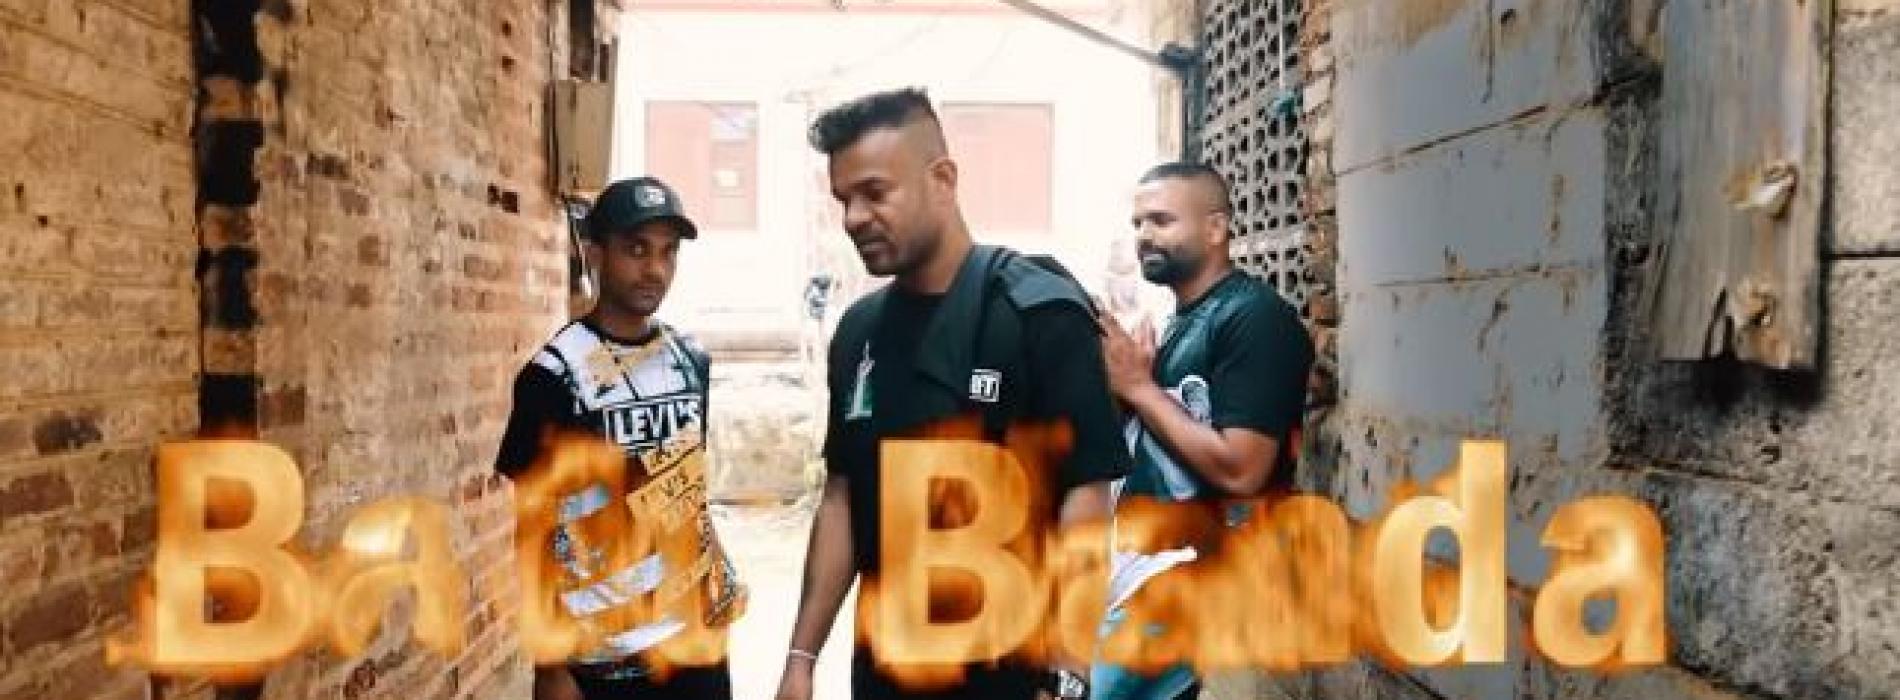 New Music : Alokaya – Badu Banda(බඩු භාන්ඩ) Feat Fill T & Max Demon   Produced By DILU BEATS